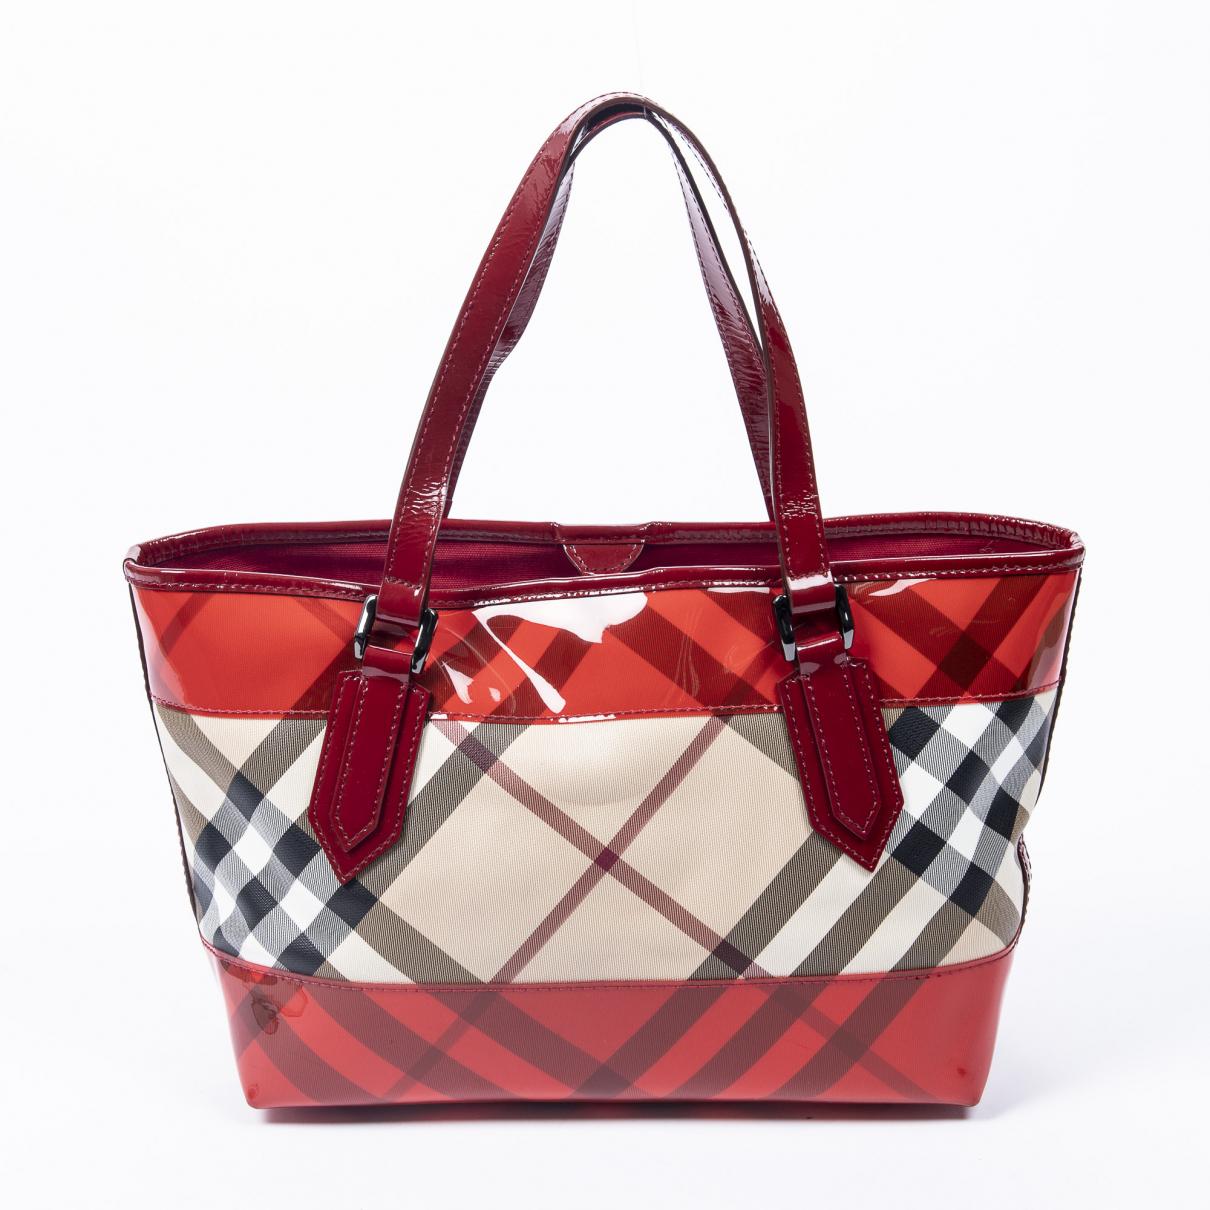 Burberry \N Handtasche in  Rot Leder